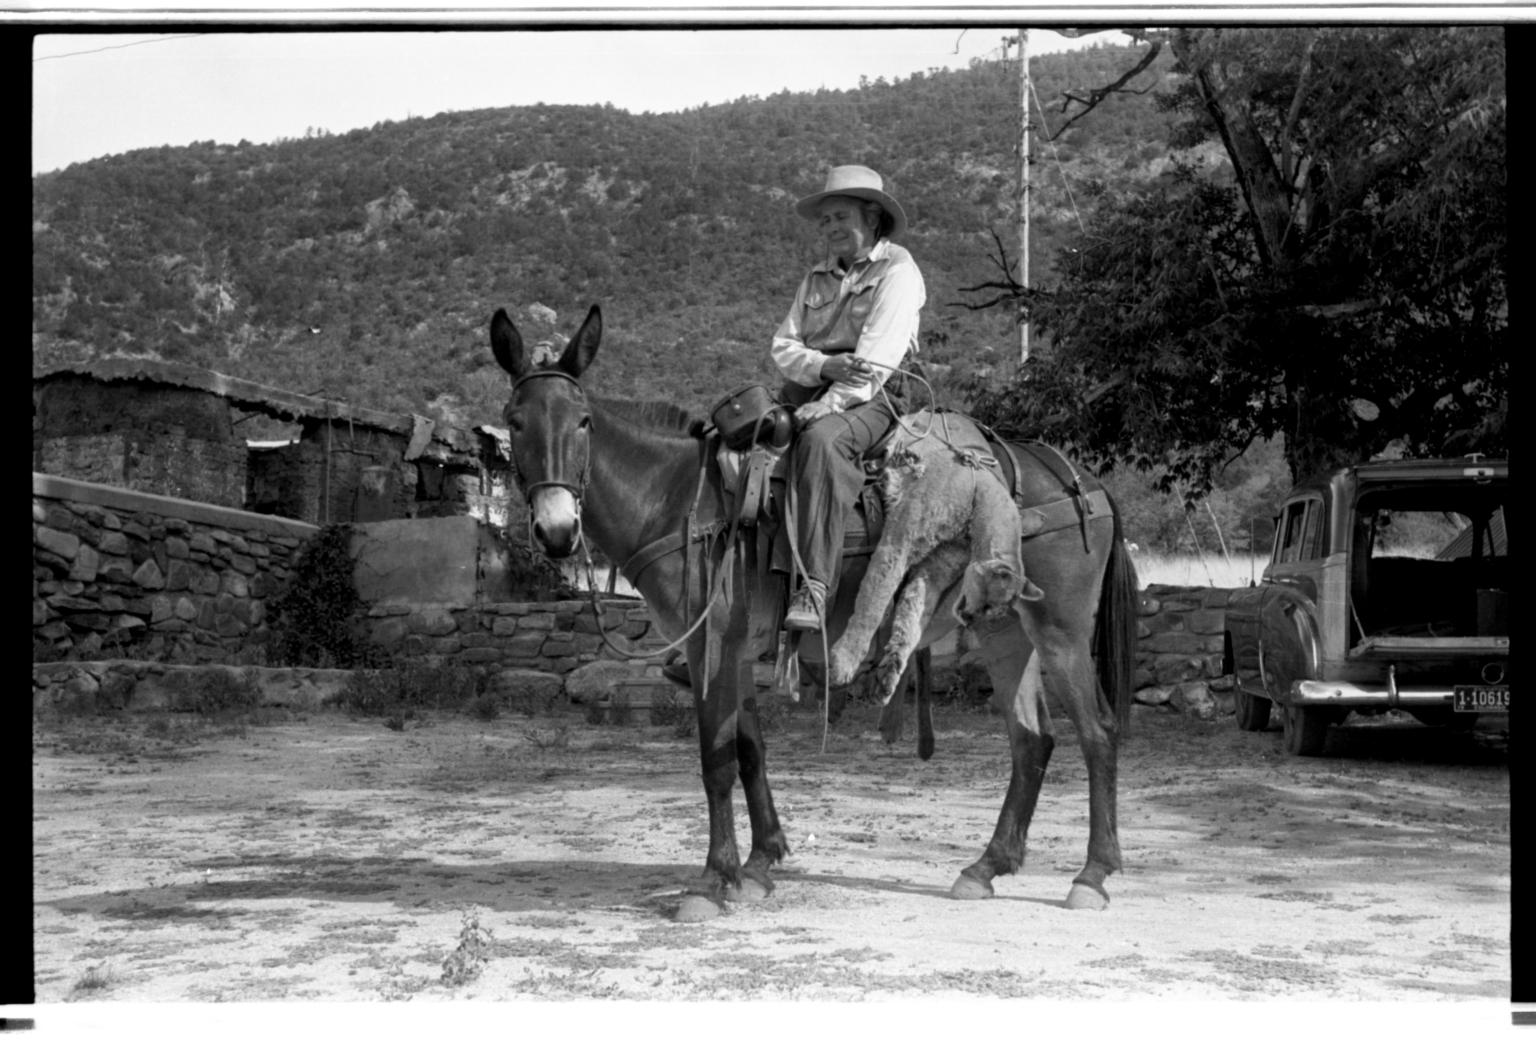 Ila Healy on Donkey